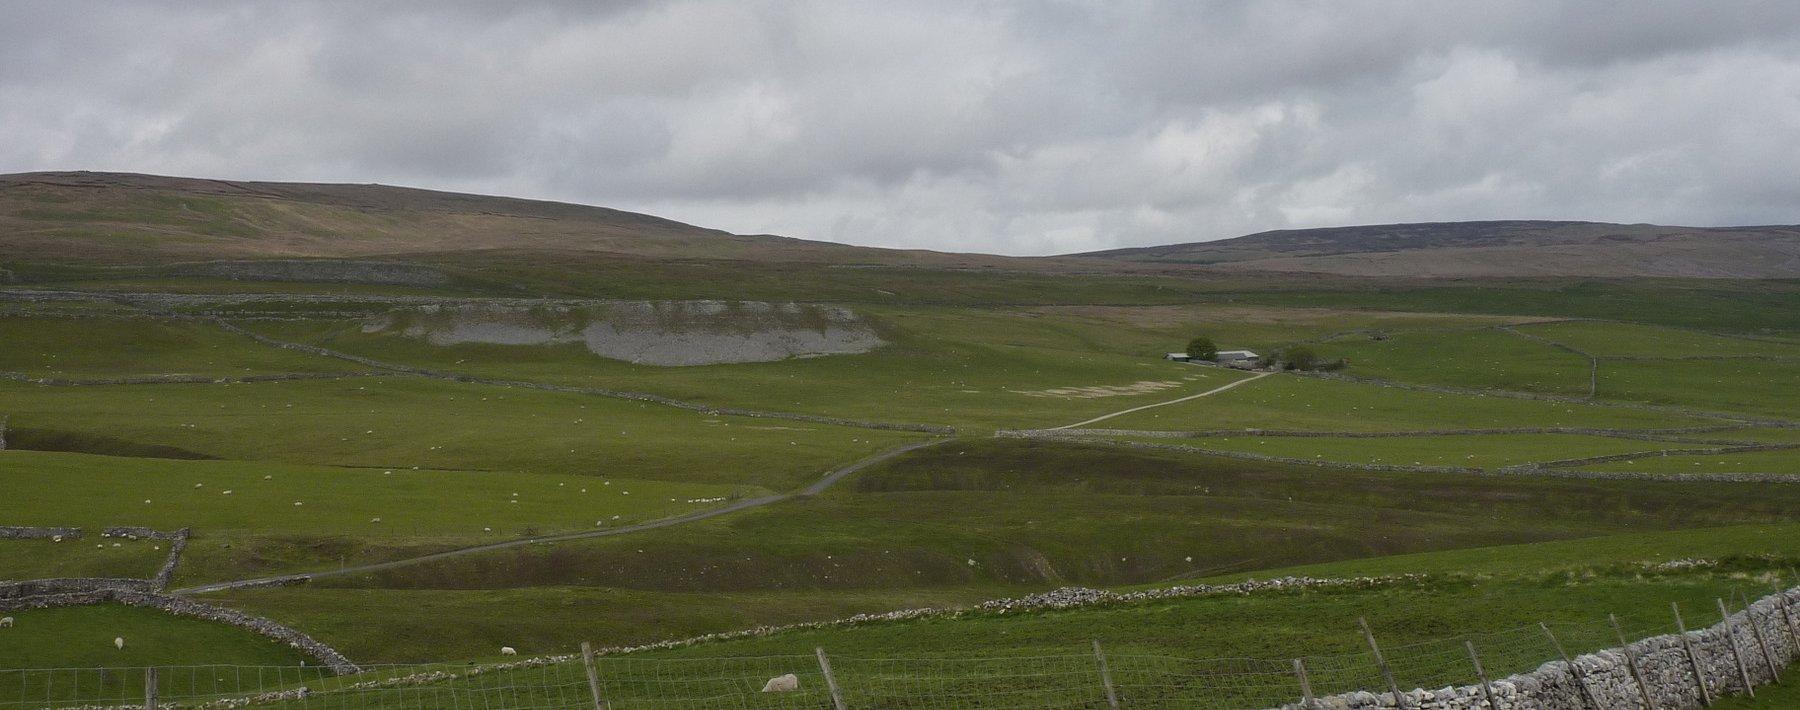 Approaching Tenant Gill Farm